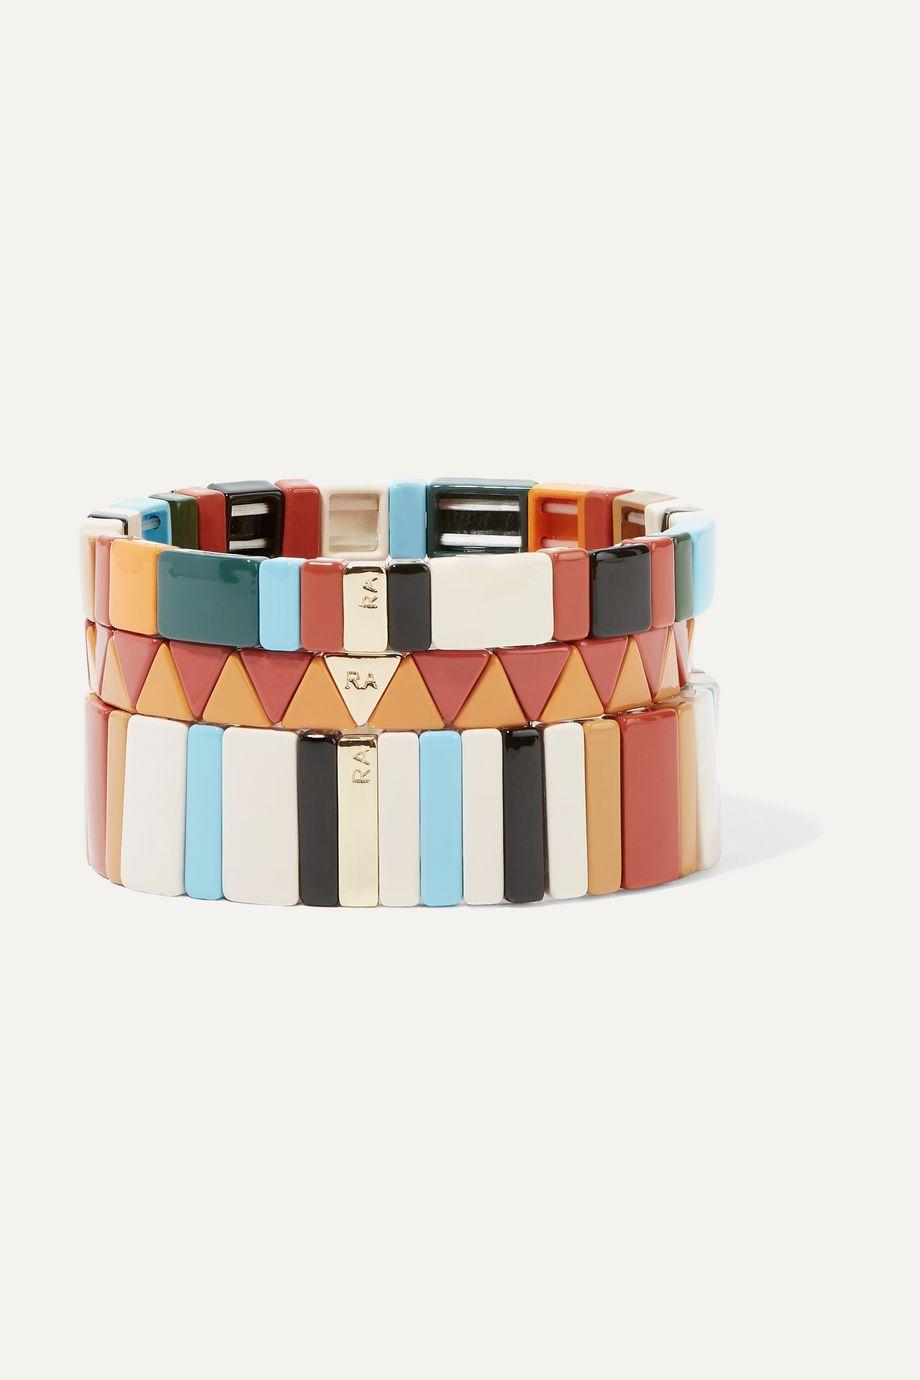 Roxanne Assoulin Canyon 搪瓷手链(三条装)